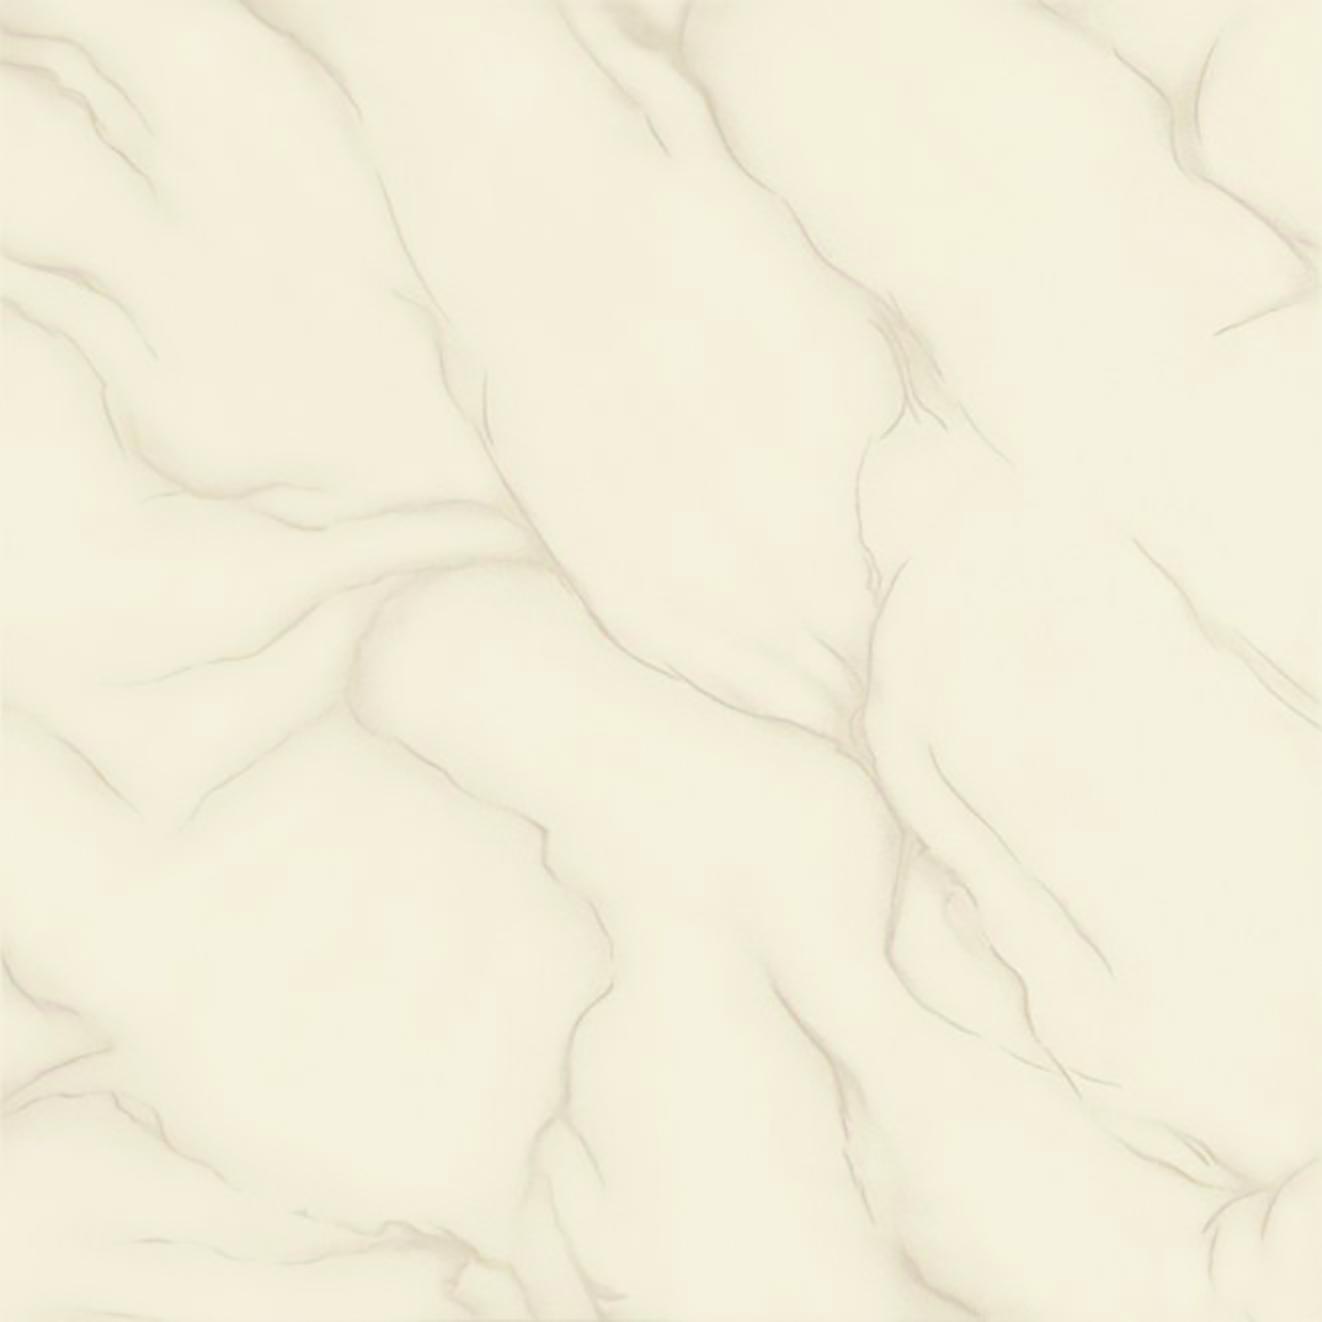 Soluble Salt 600x600 MM